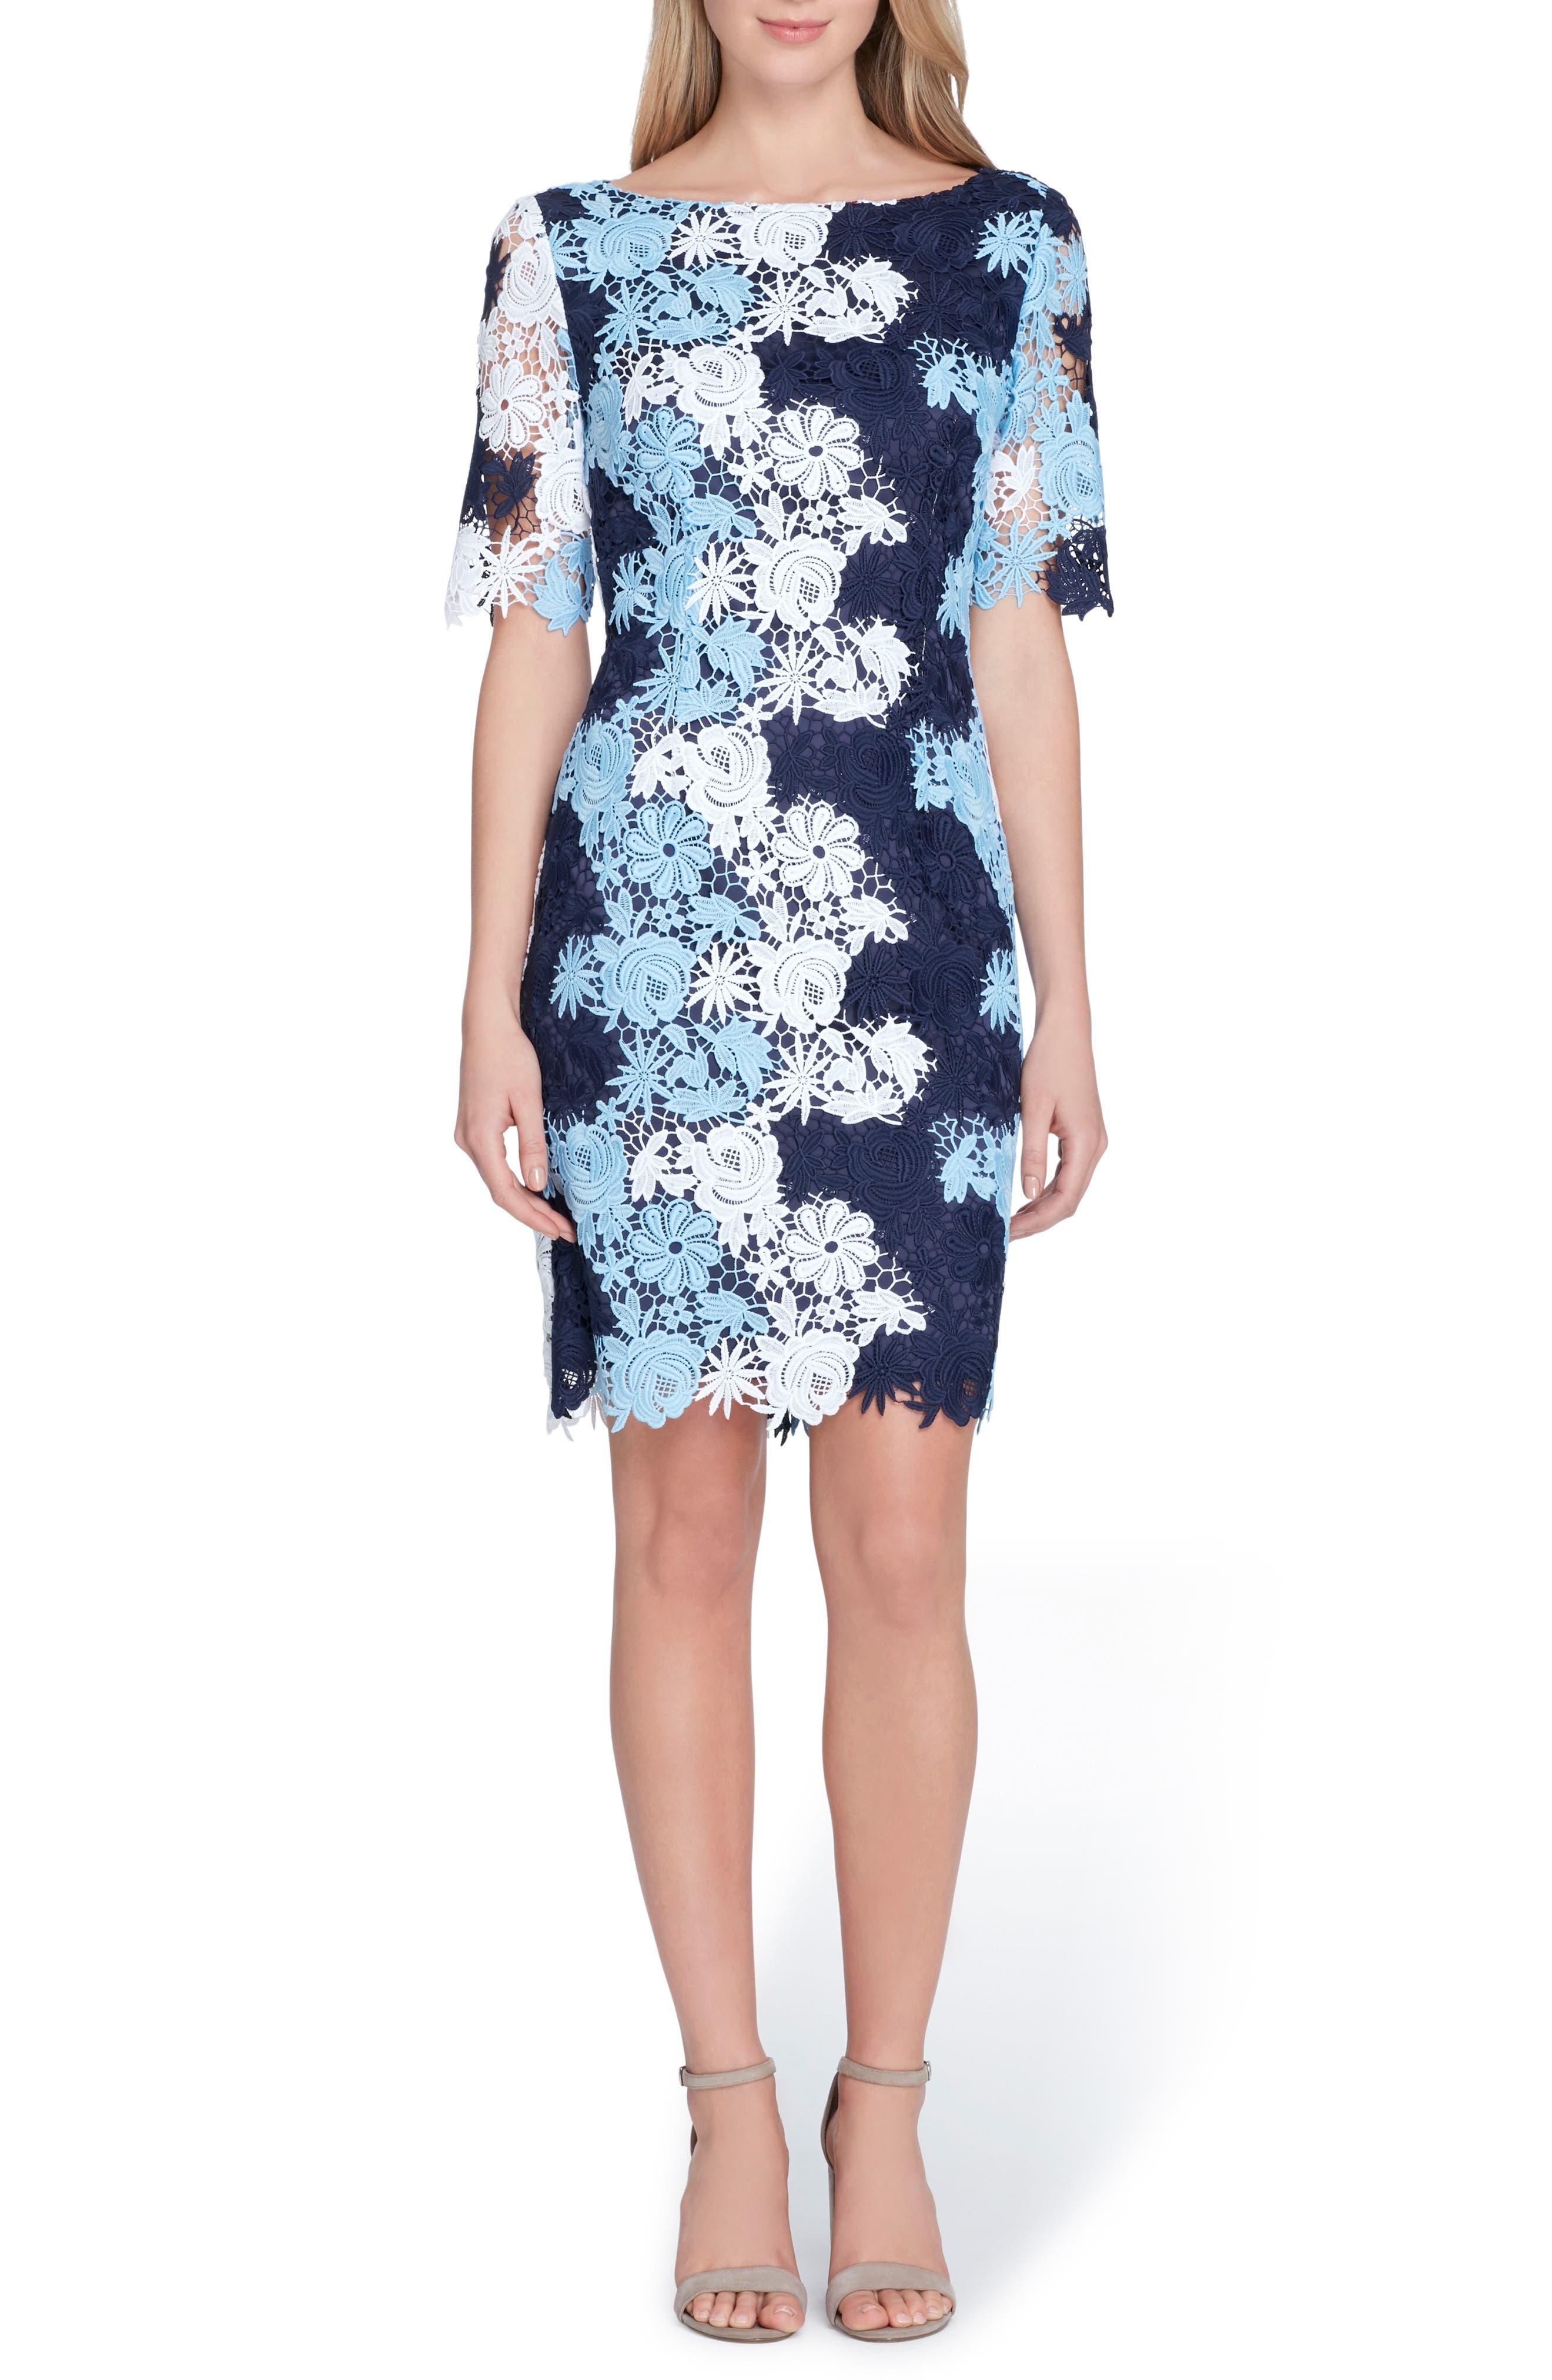 TAHARI Multicolor Lace Sheath Dress, Main, color, 478